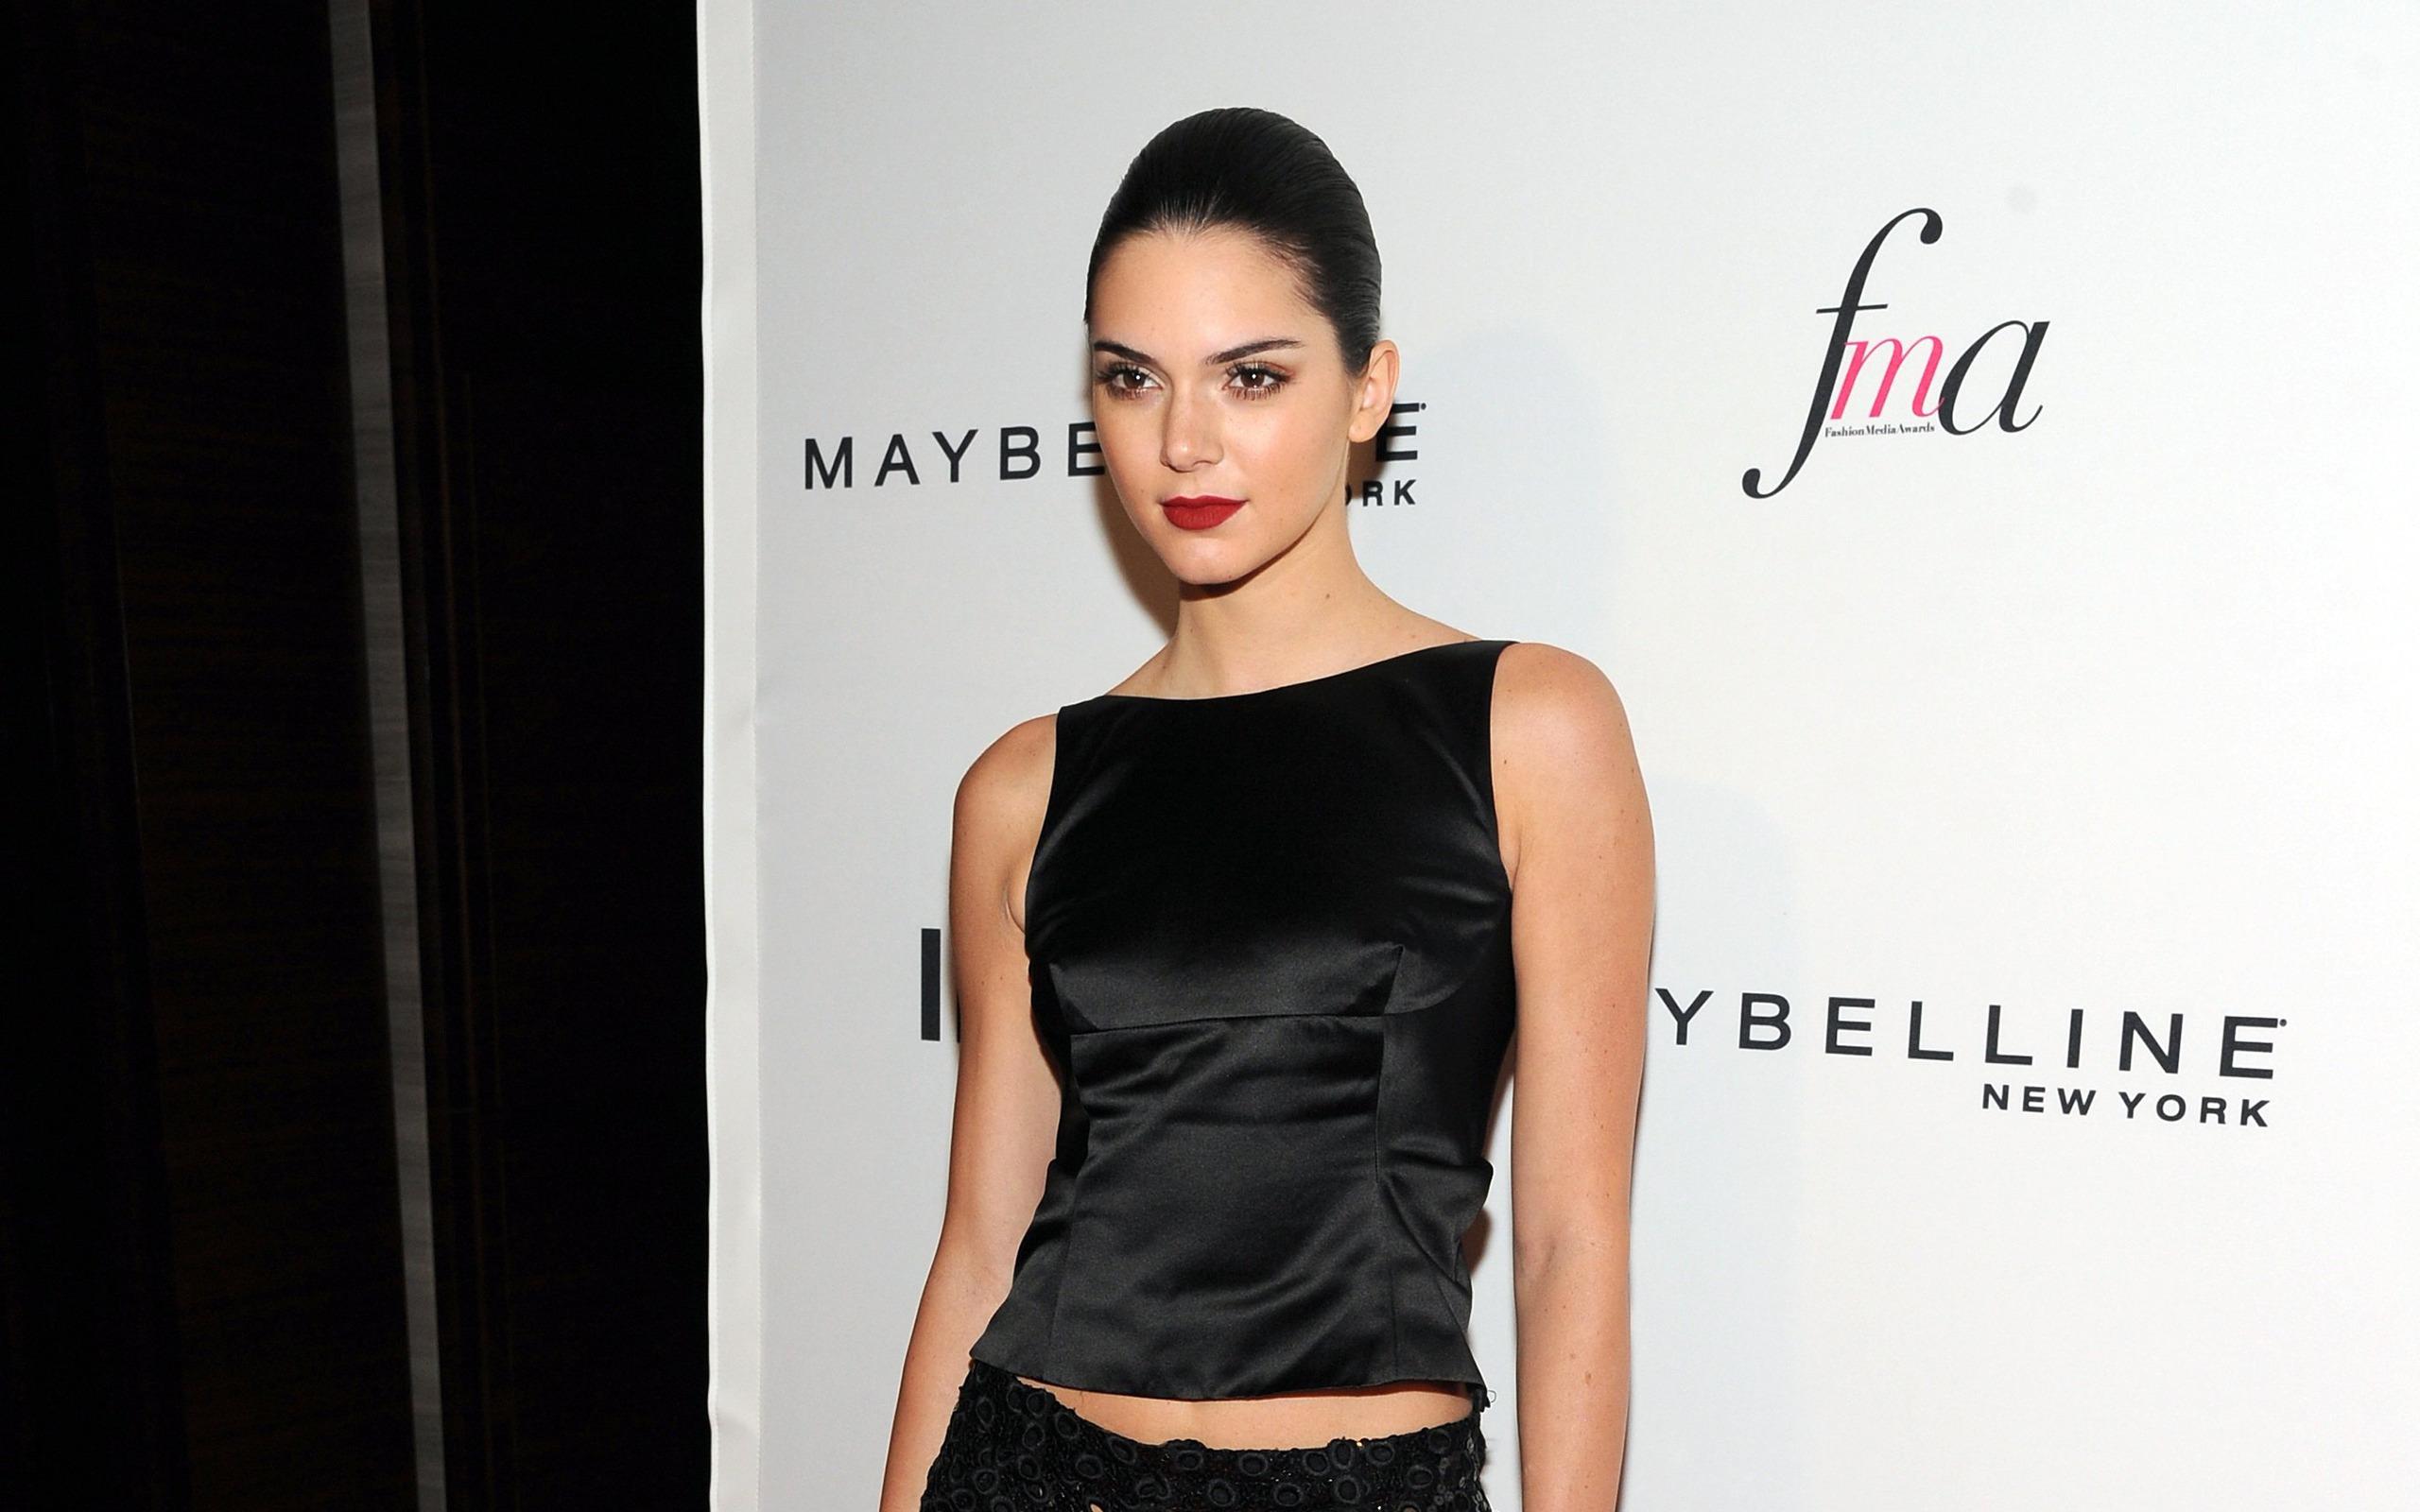 Kendall Jenner Celebrity Wallpaper Background 55396 2560x1600px